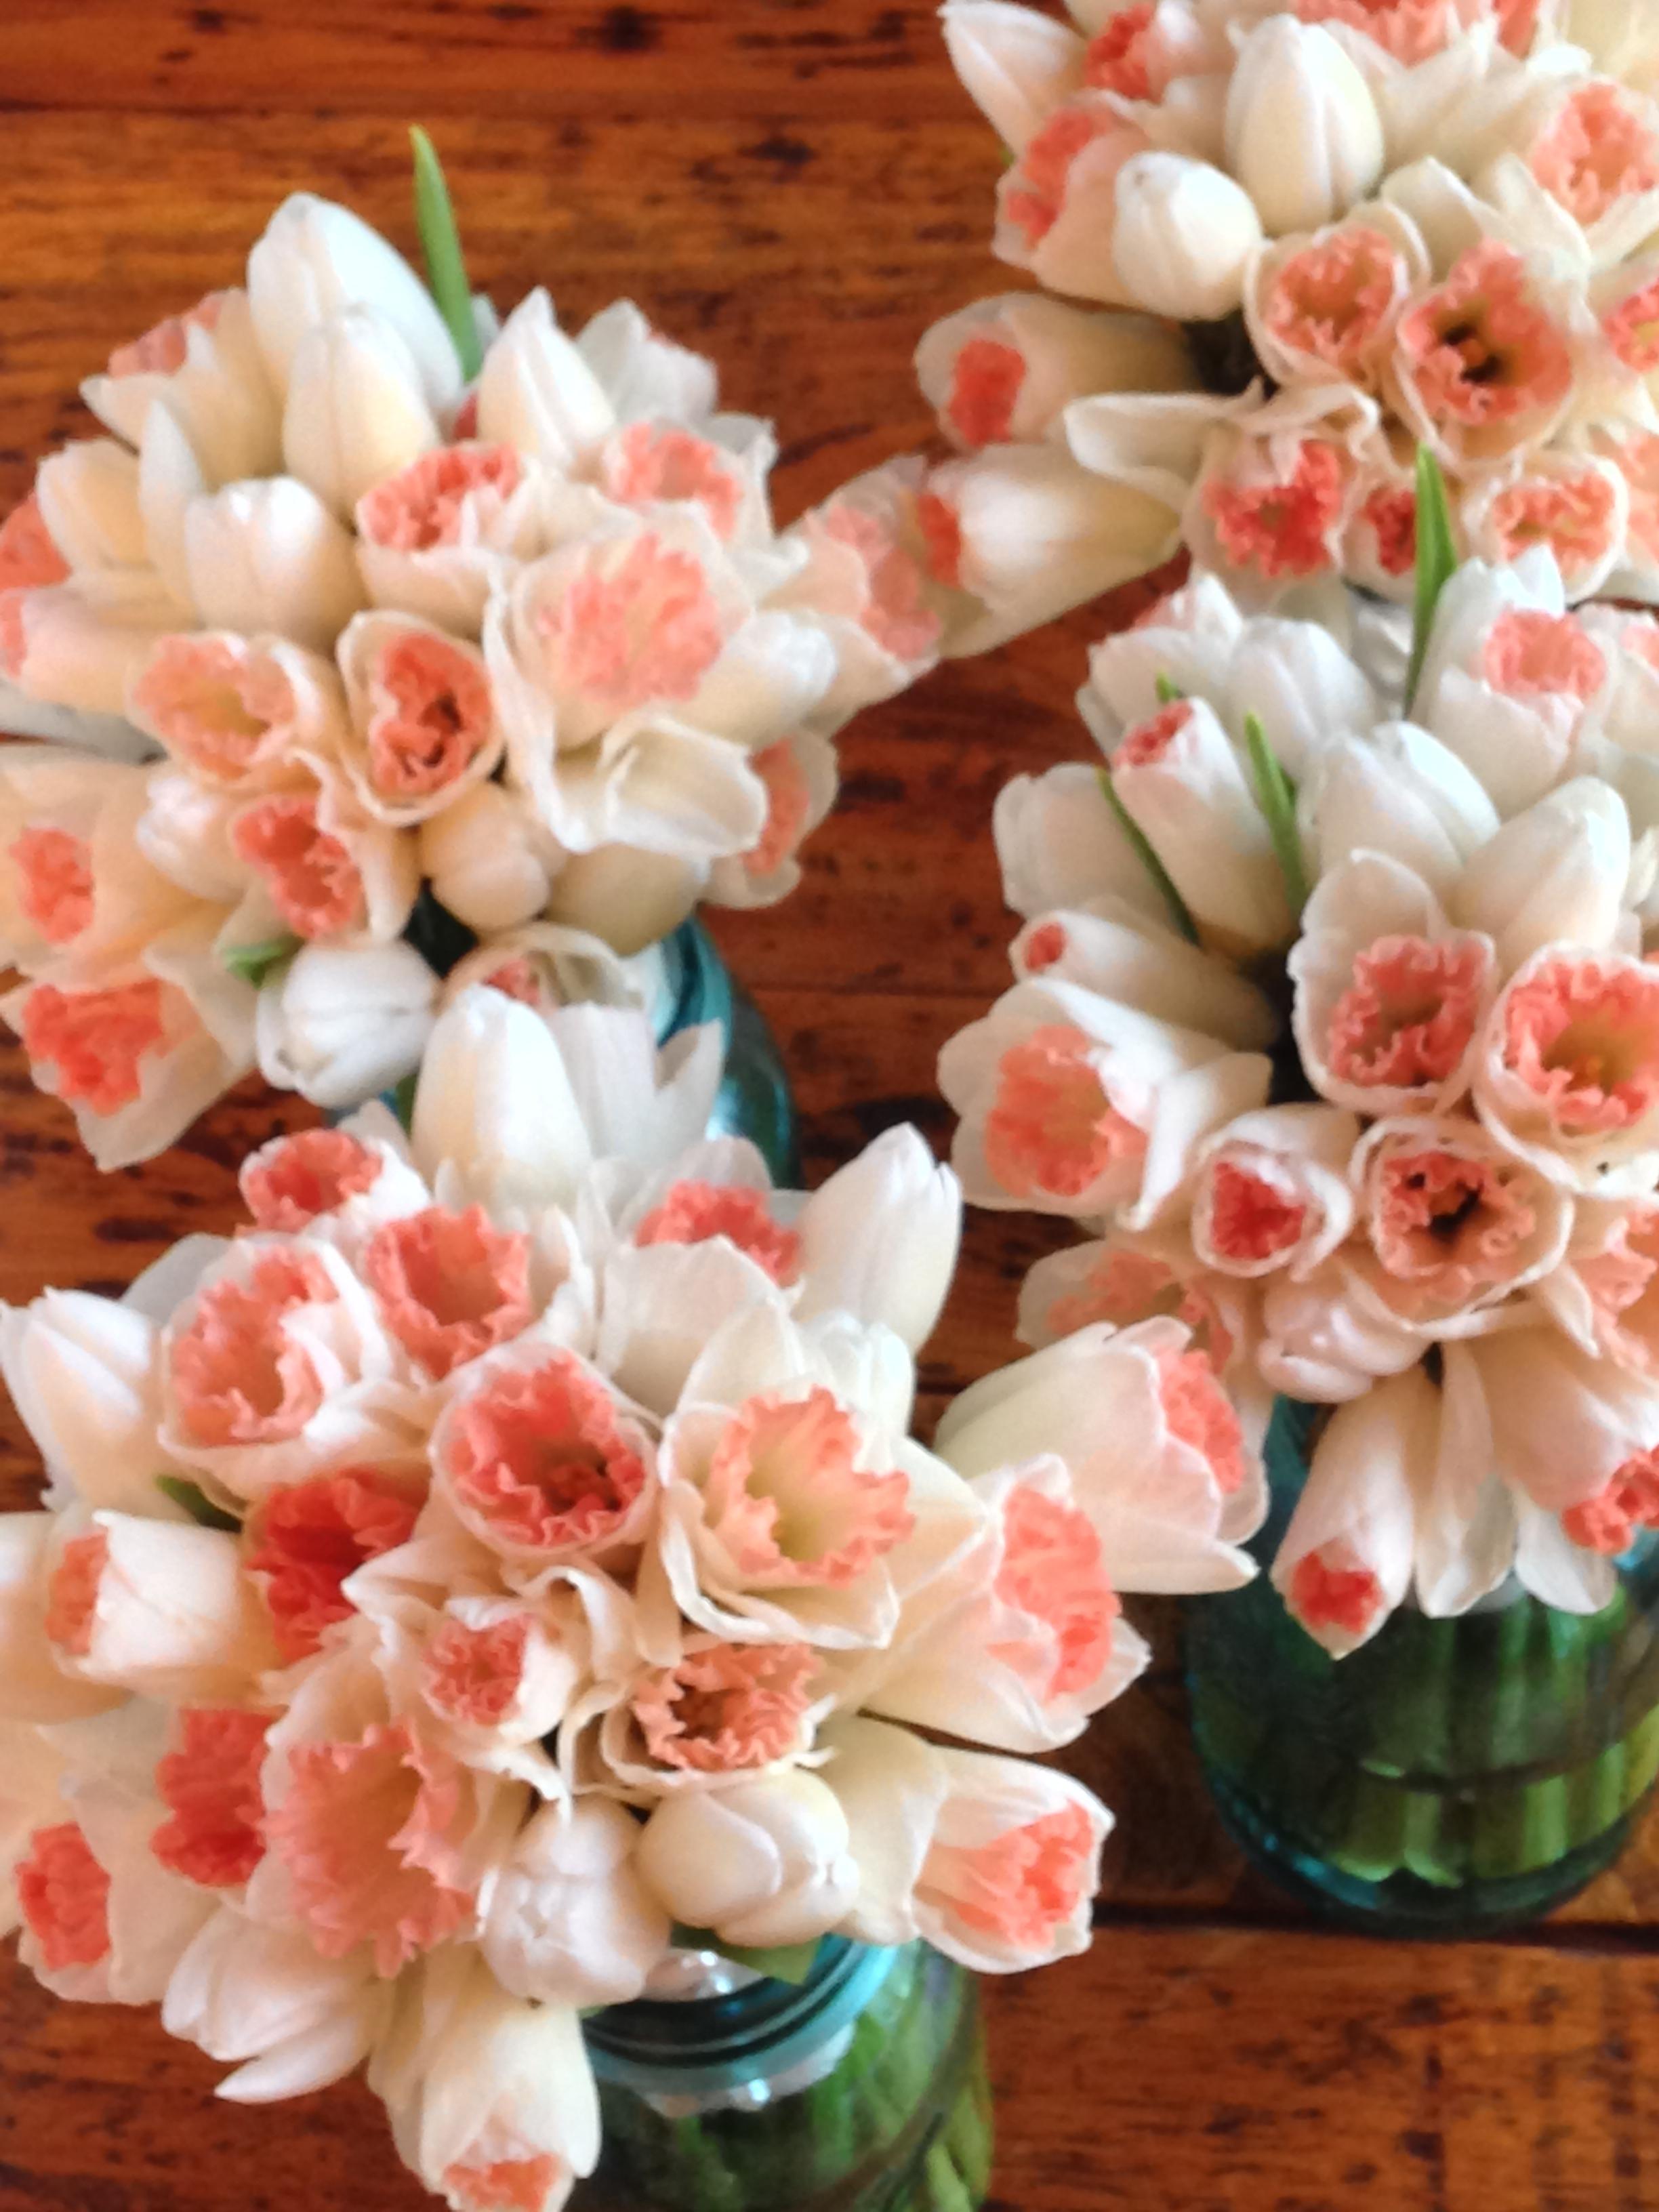 Photo by Catherine G. Damwood LLC, Image ofBridesmaids' Bouquets